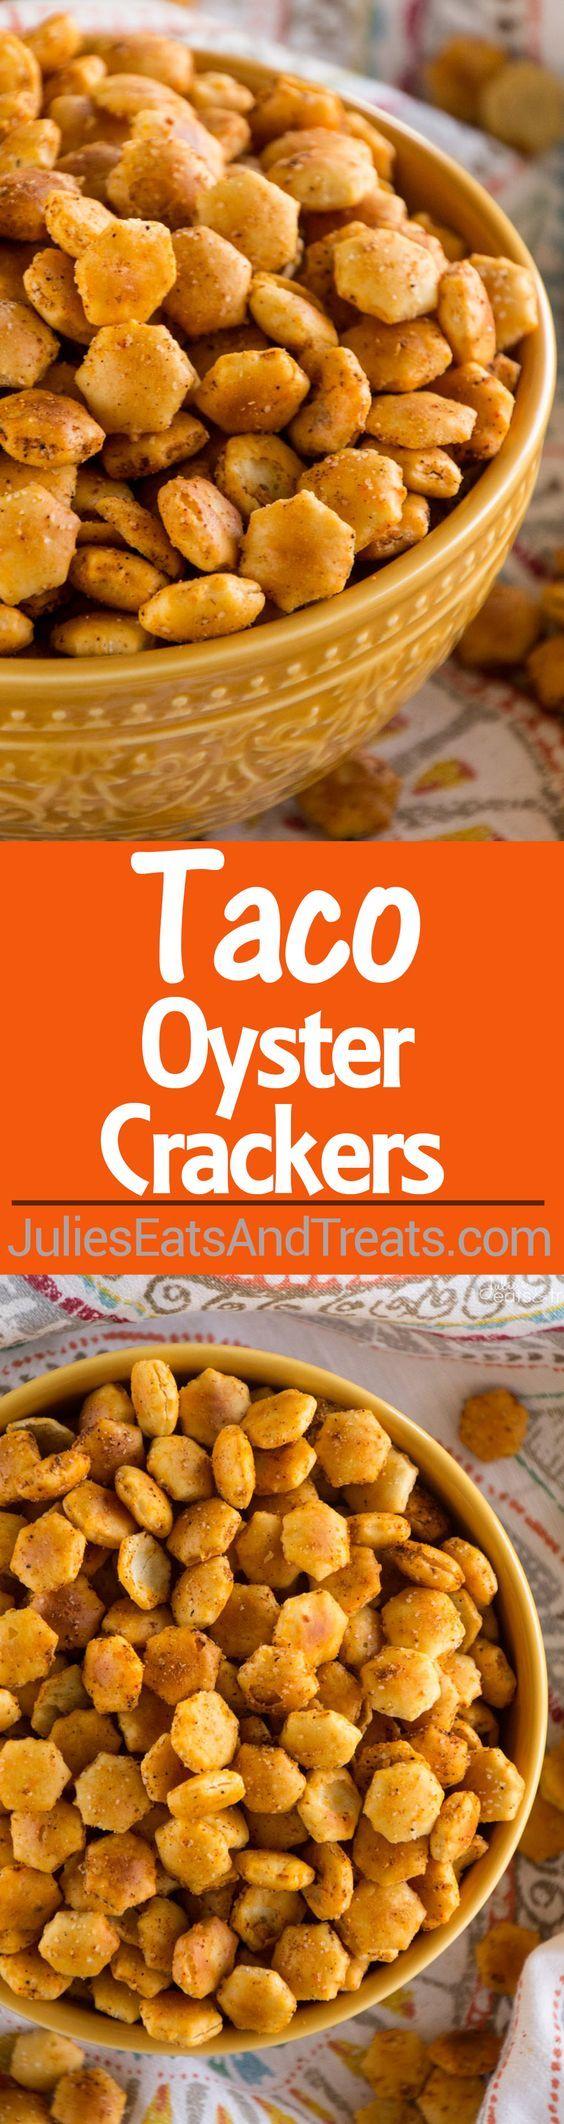 Taco oyster crackers recipe quick easy snack recipe with a kick taco oyster crackers recipe quick easy snack recipe with a kick that nobody will solutioingenieria Choice Image